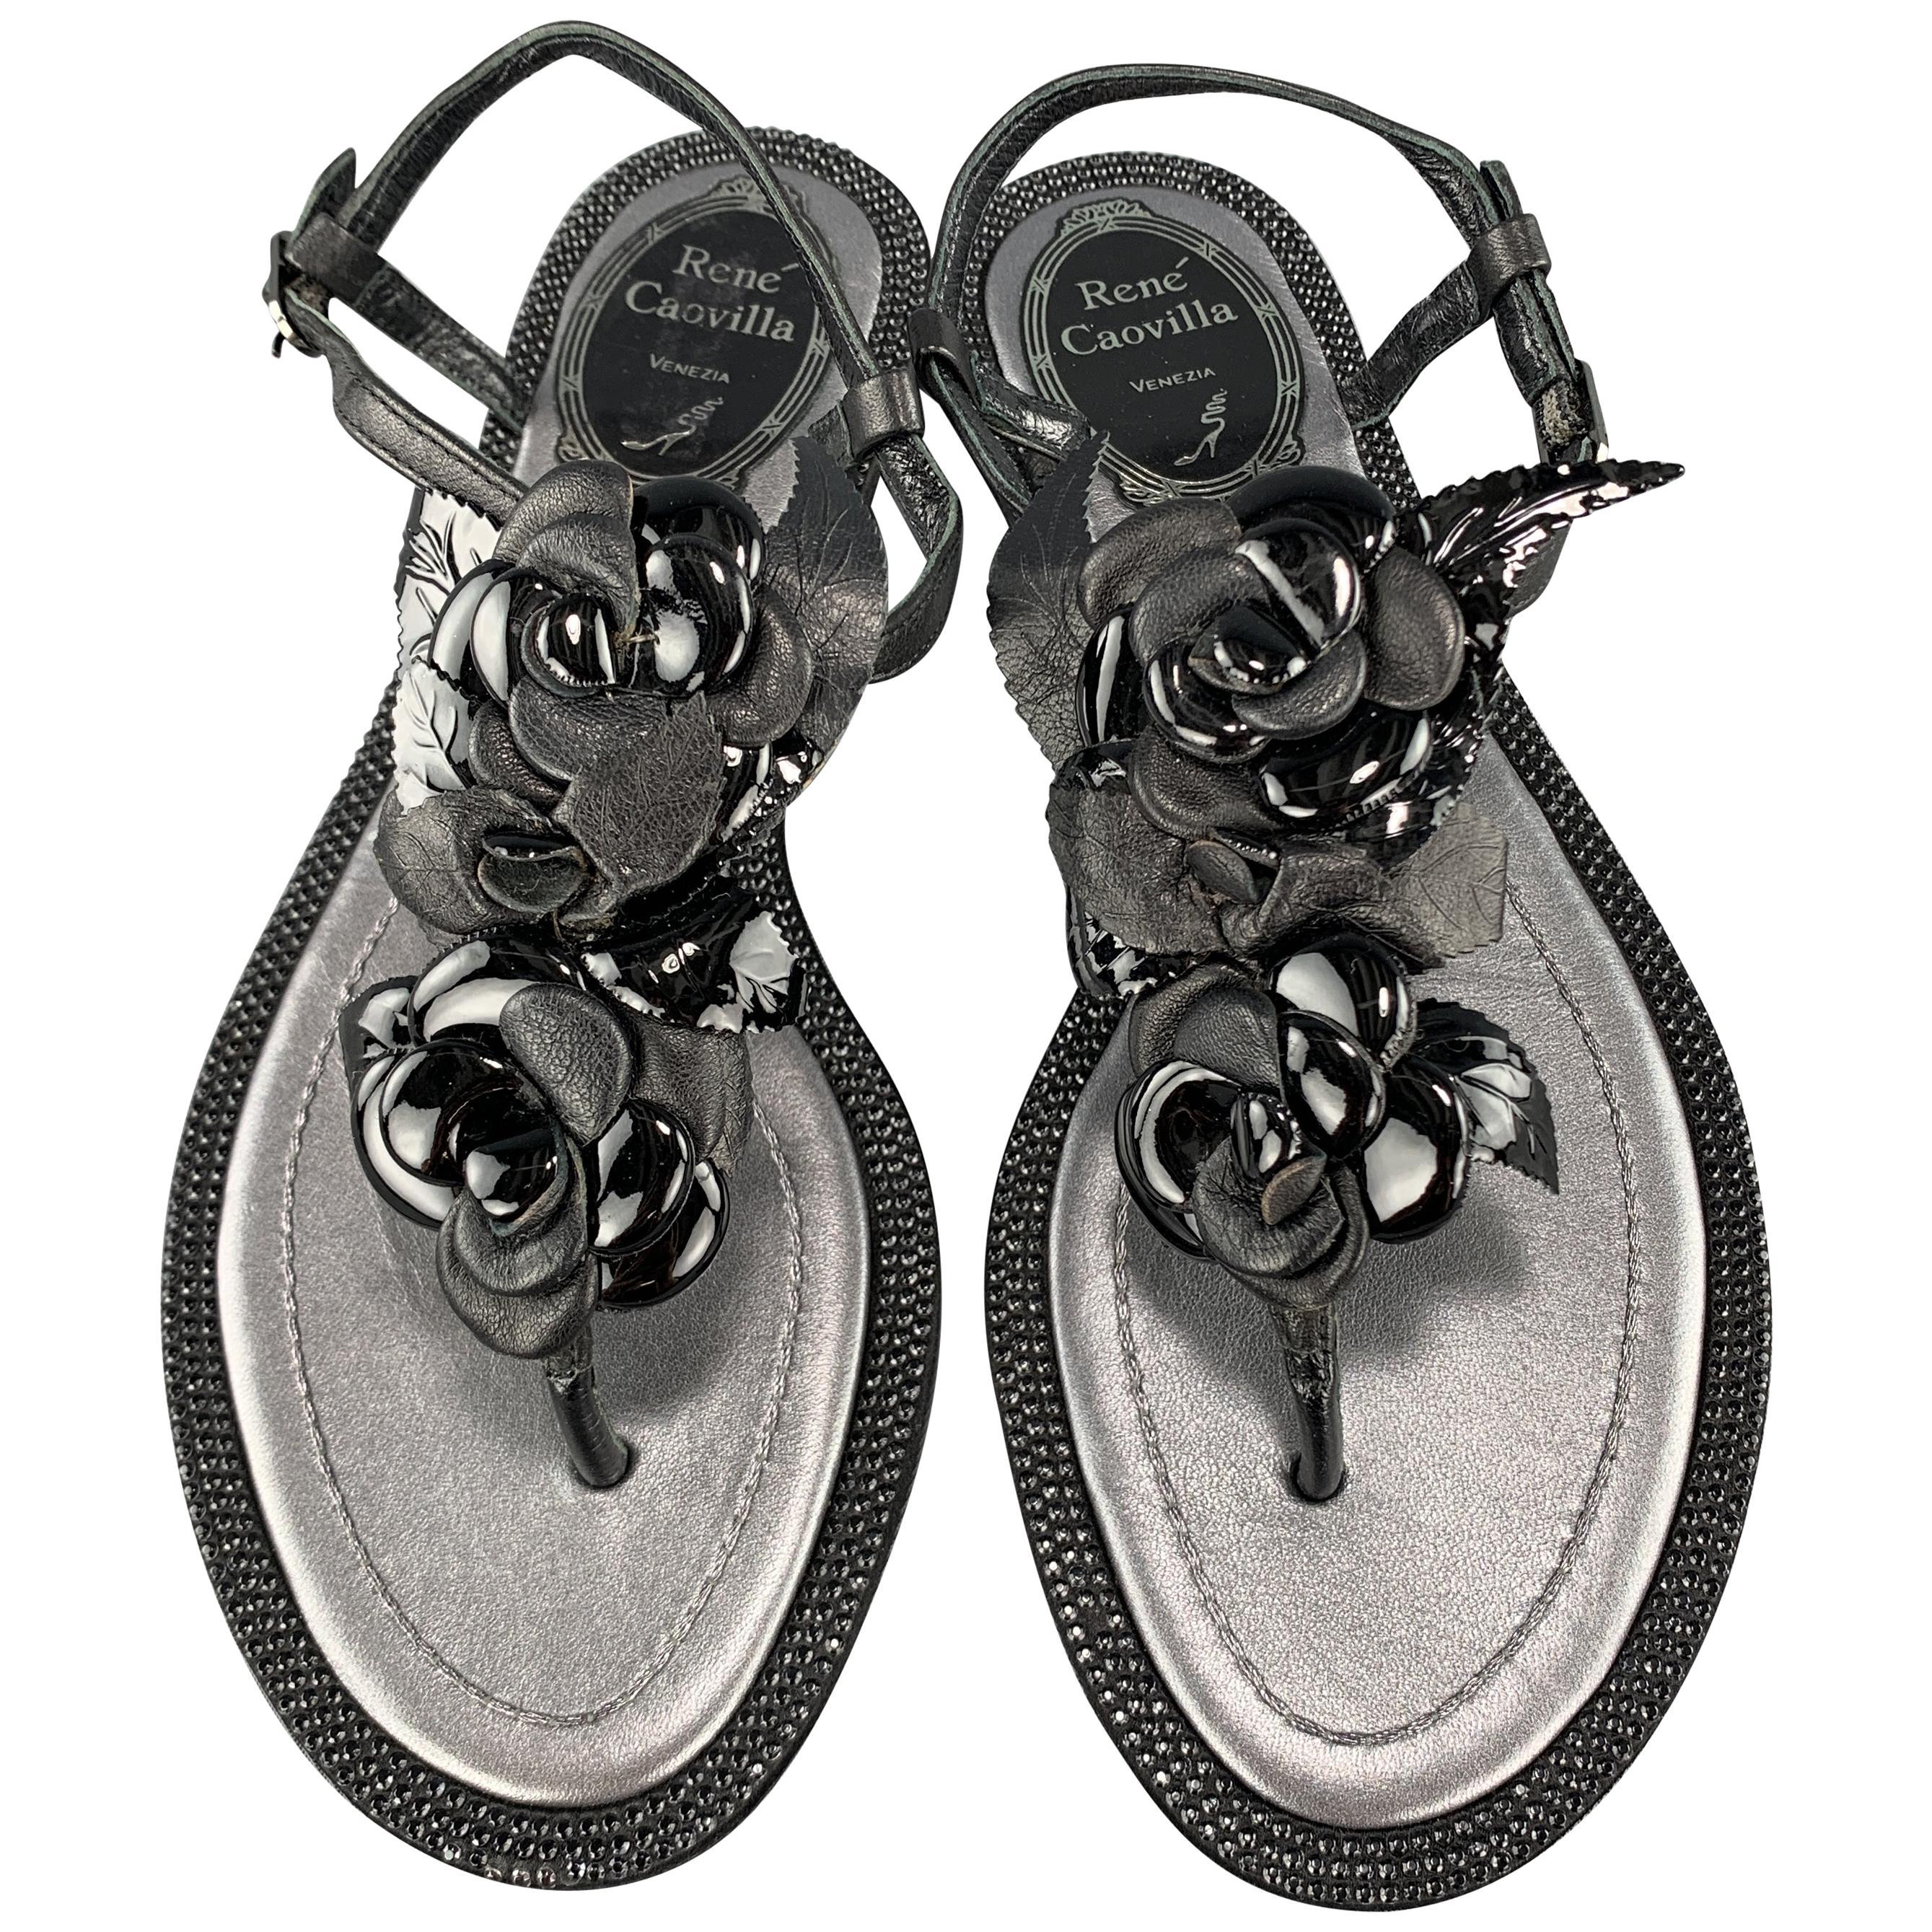 RENE CAOVILLA Size 4 Black Leather Rose T Strap Crystal Studded Sandals